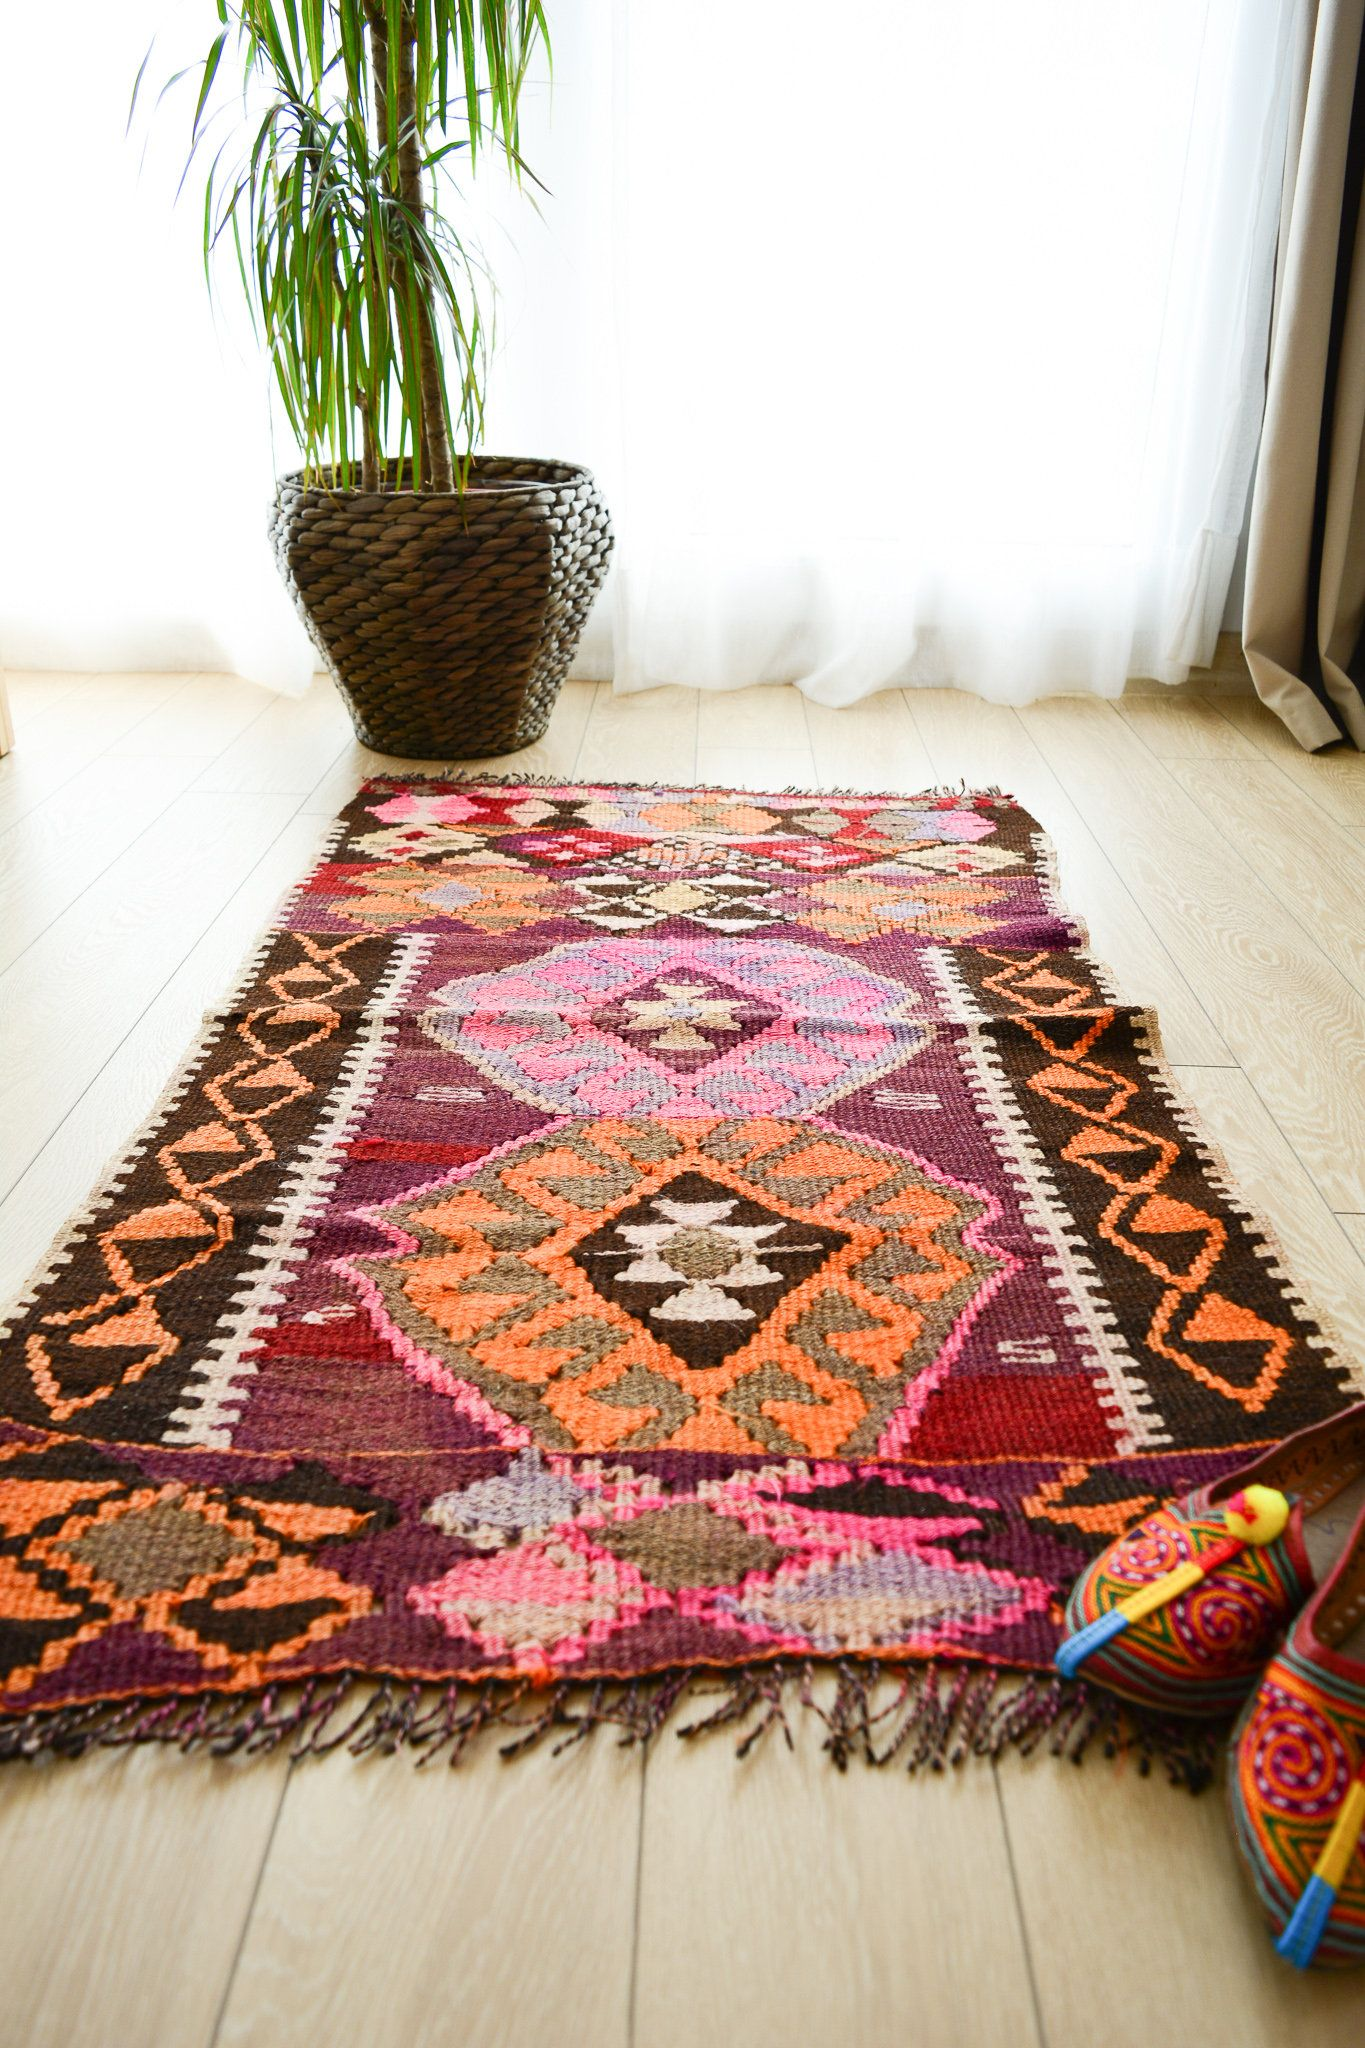 Small kilim rug area rug turkish bohemian rug vintage